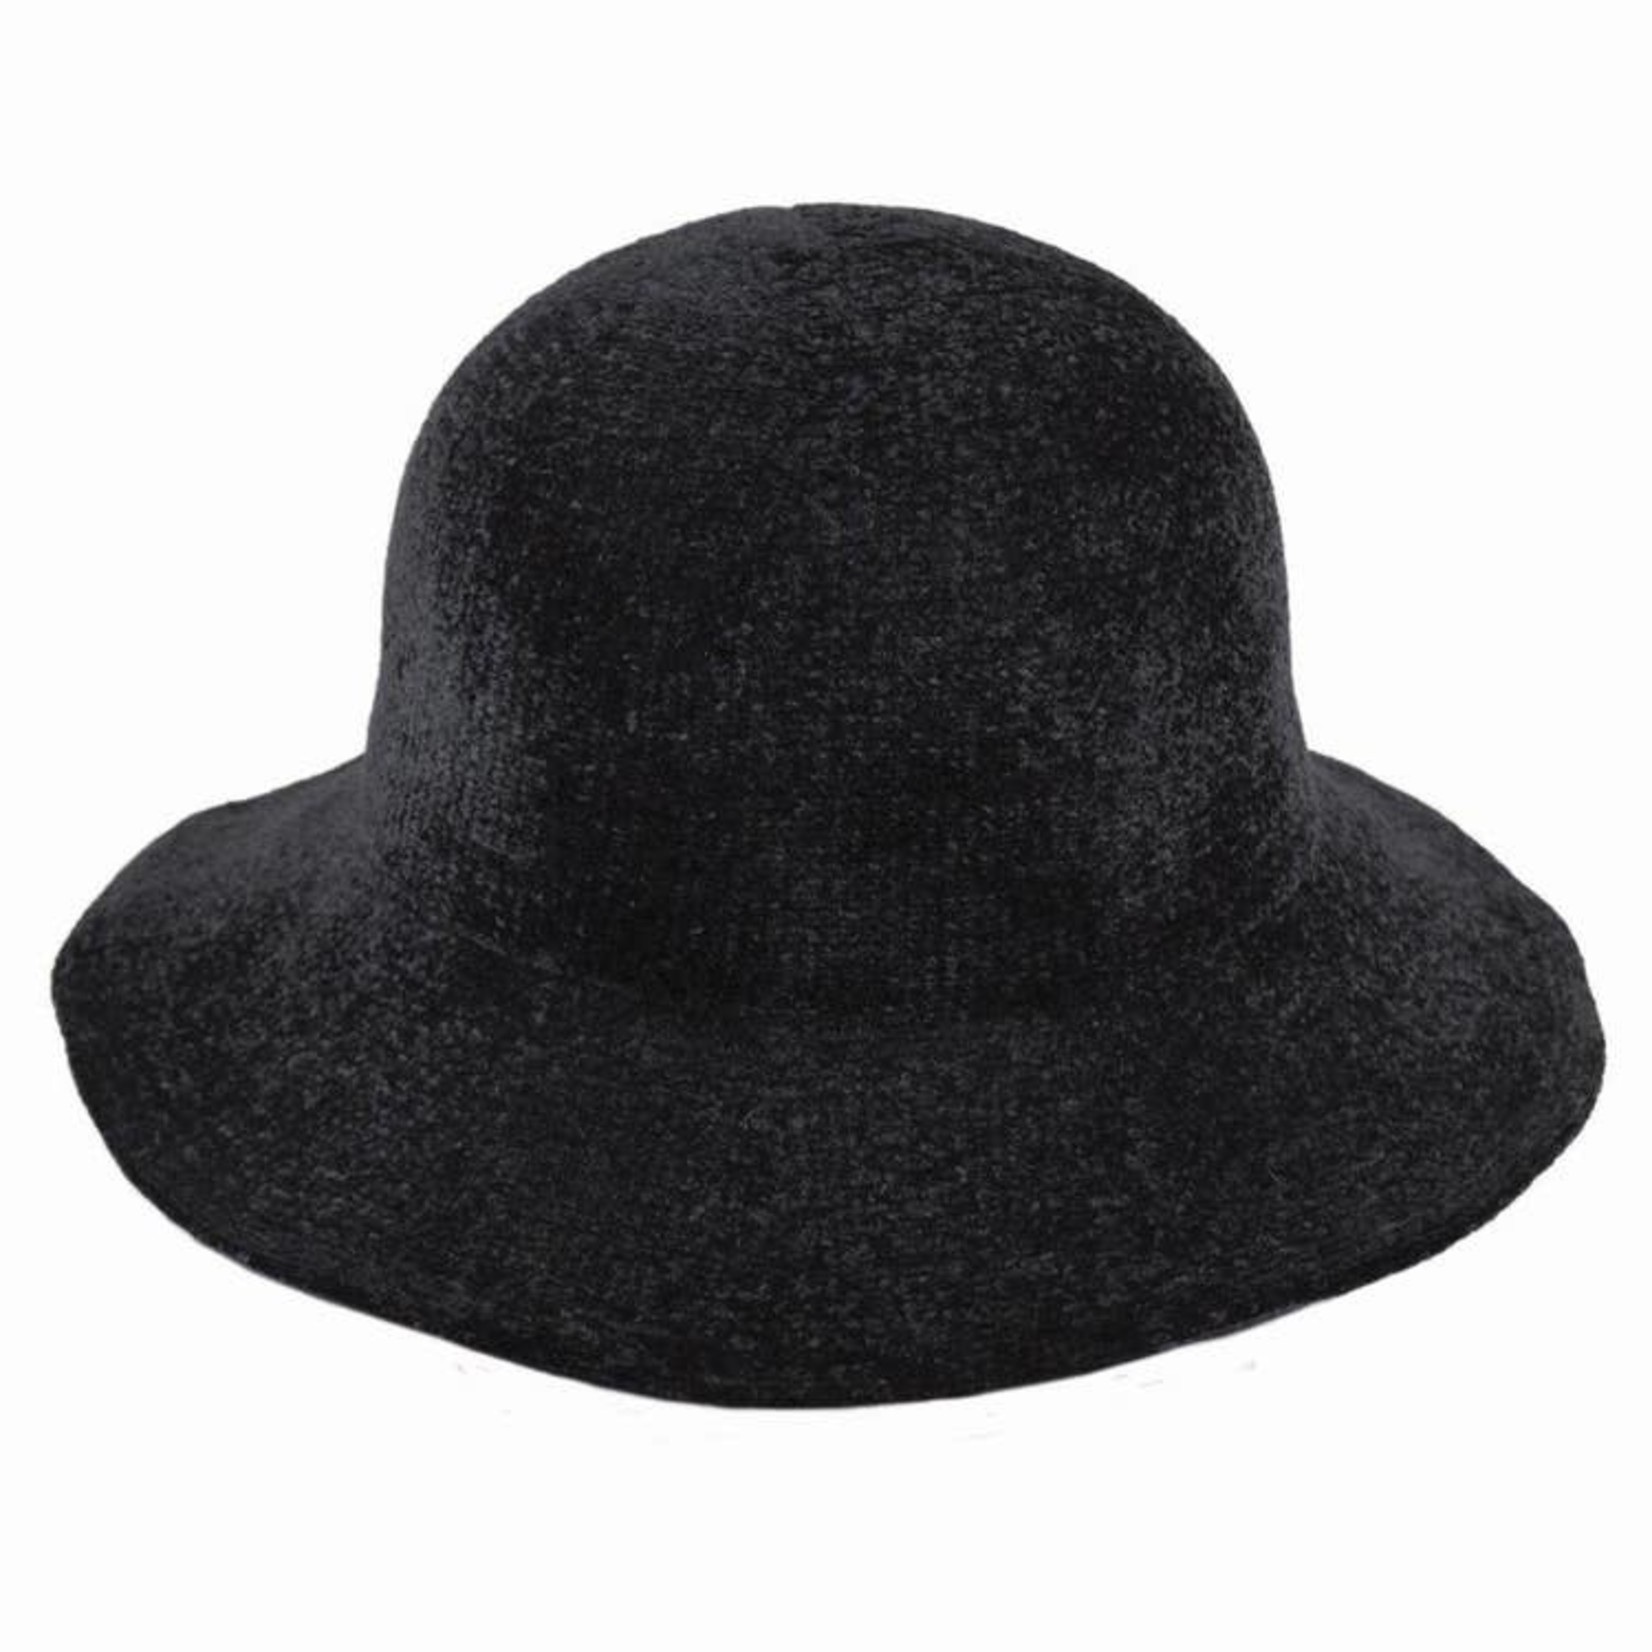 Jeanne Simmons 100% Chenille Floppy Brim Hat - Black